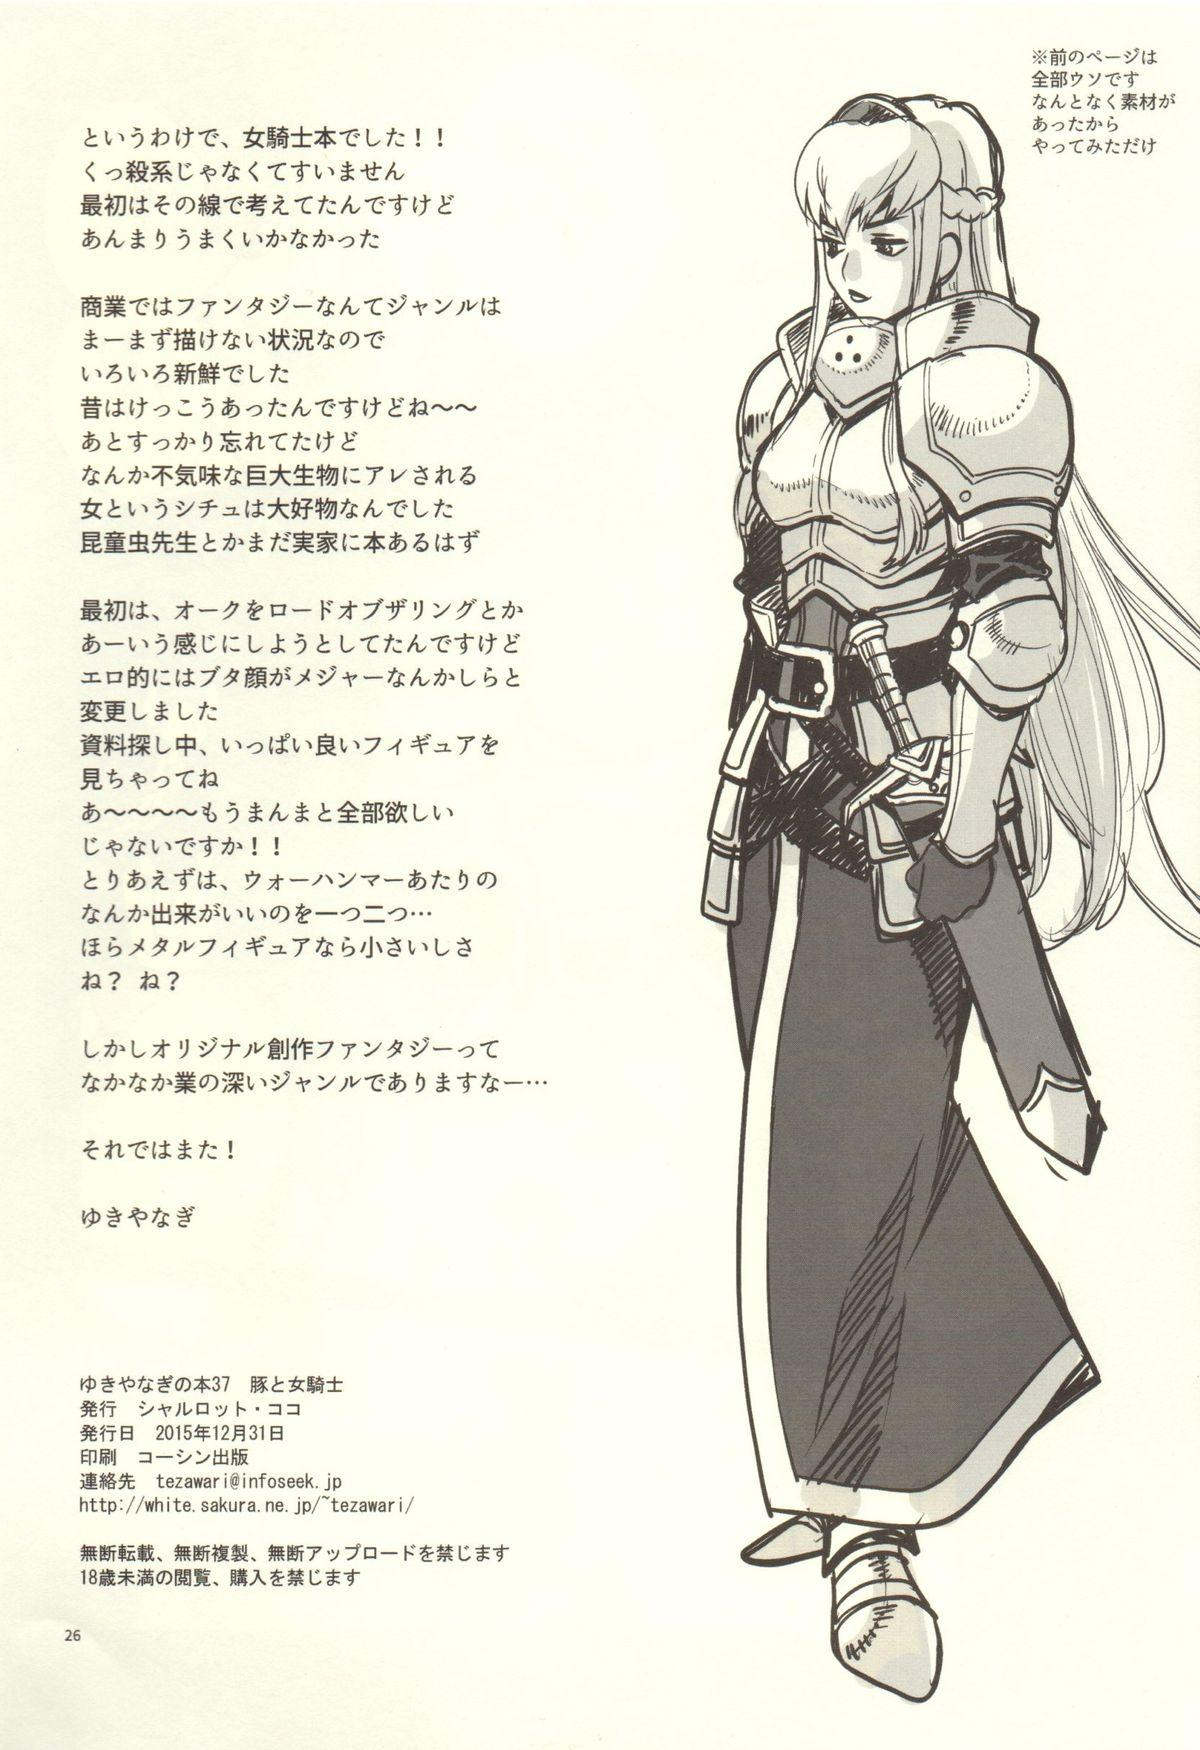 Yukiyanagi no Hon 37 Buta to Onnakishi - Lady knight in love with Orc 24